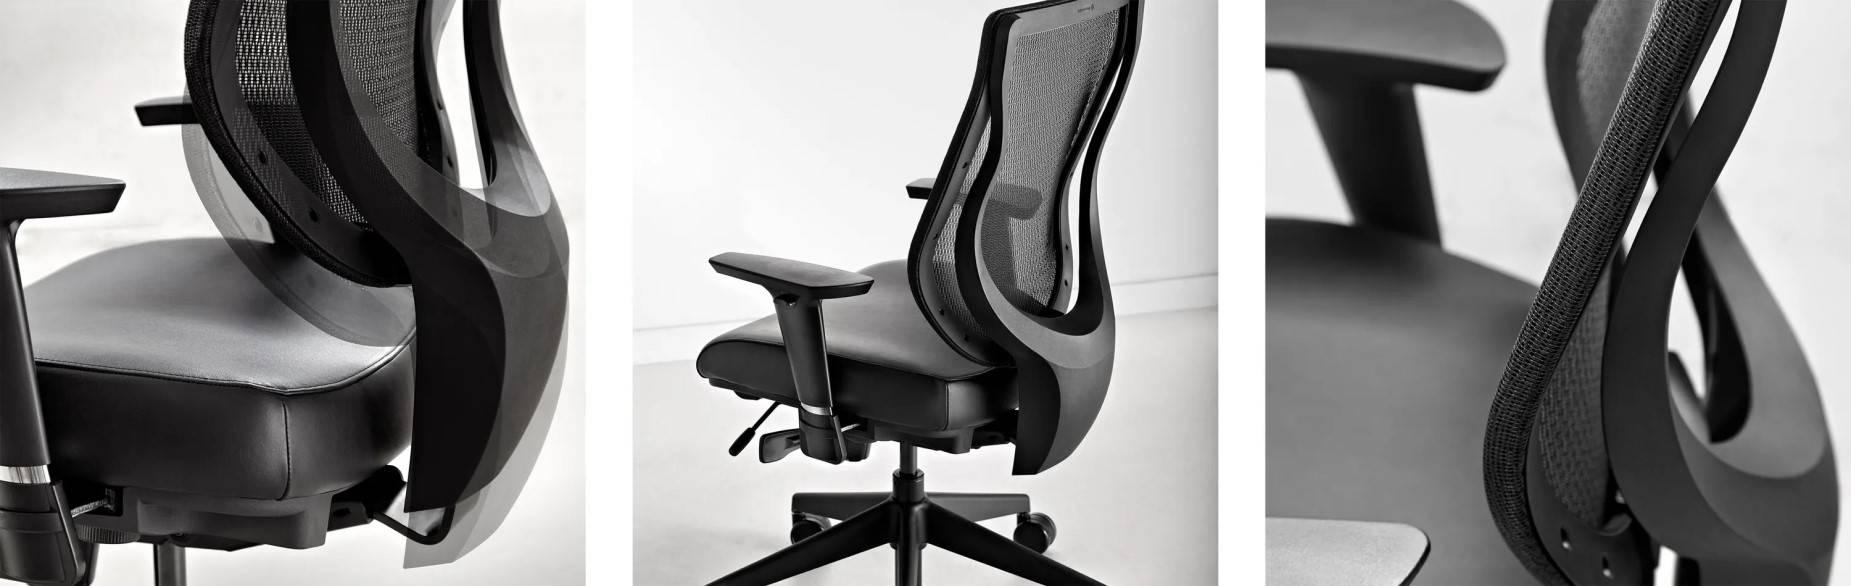 YouToo Ergonomic Chair